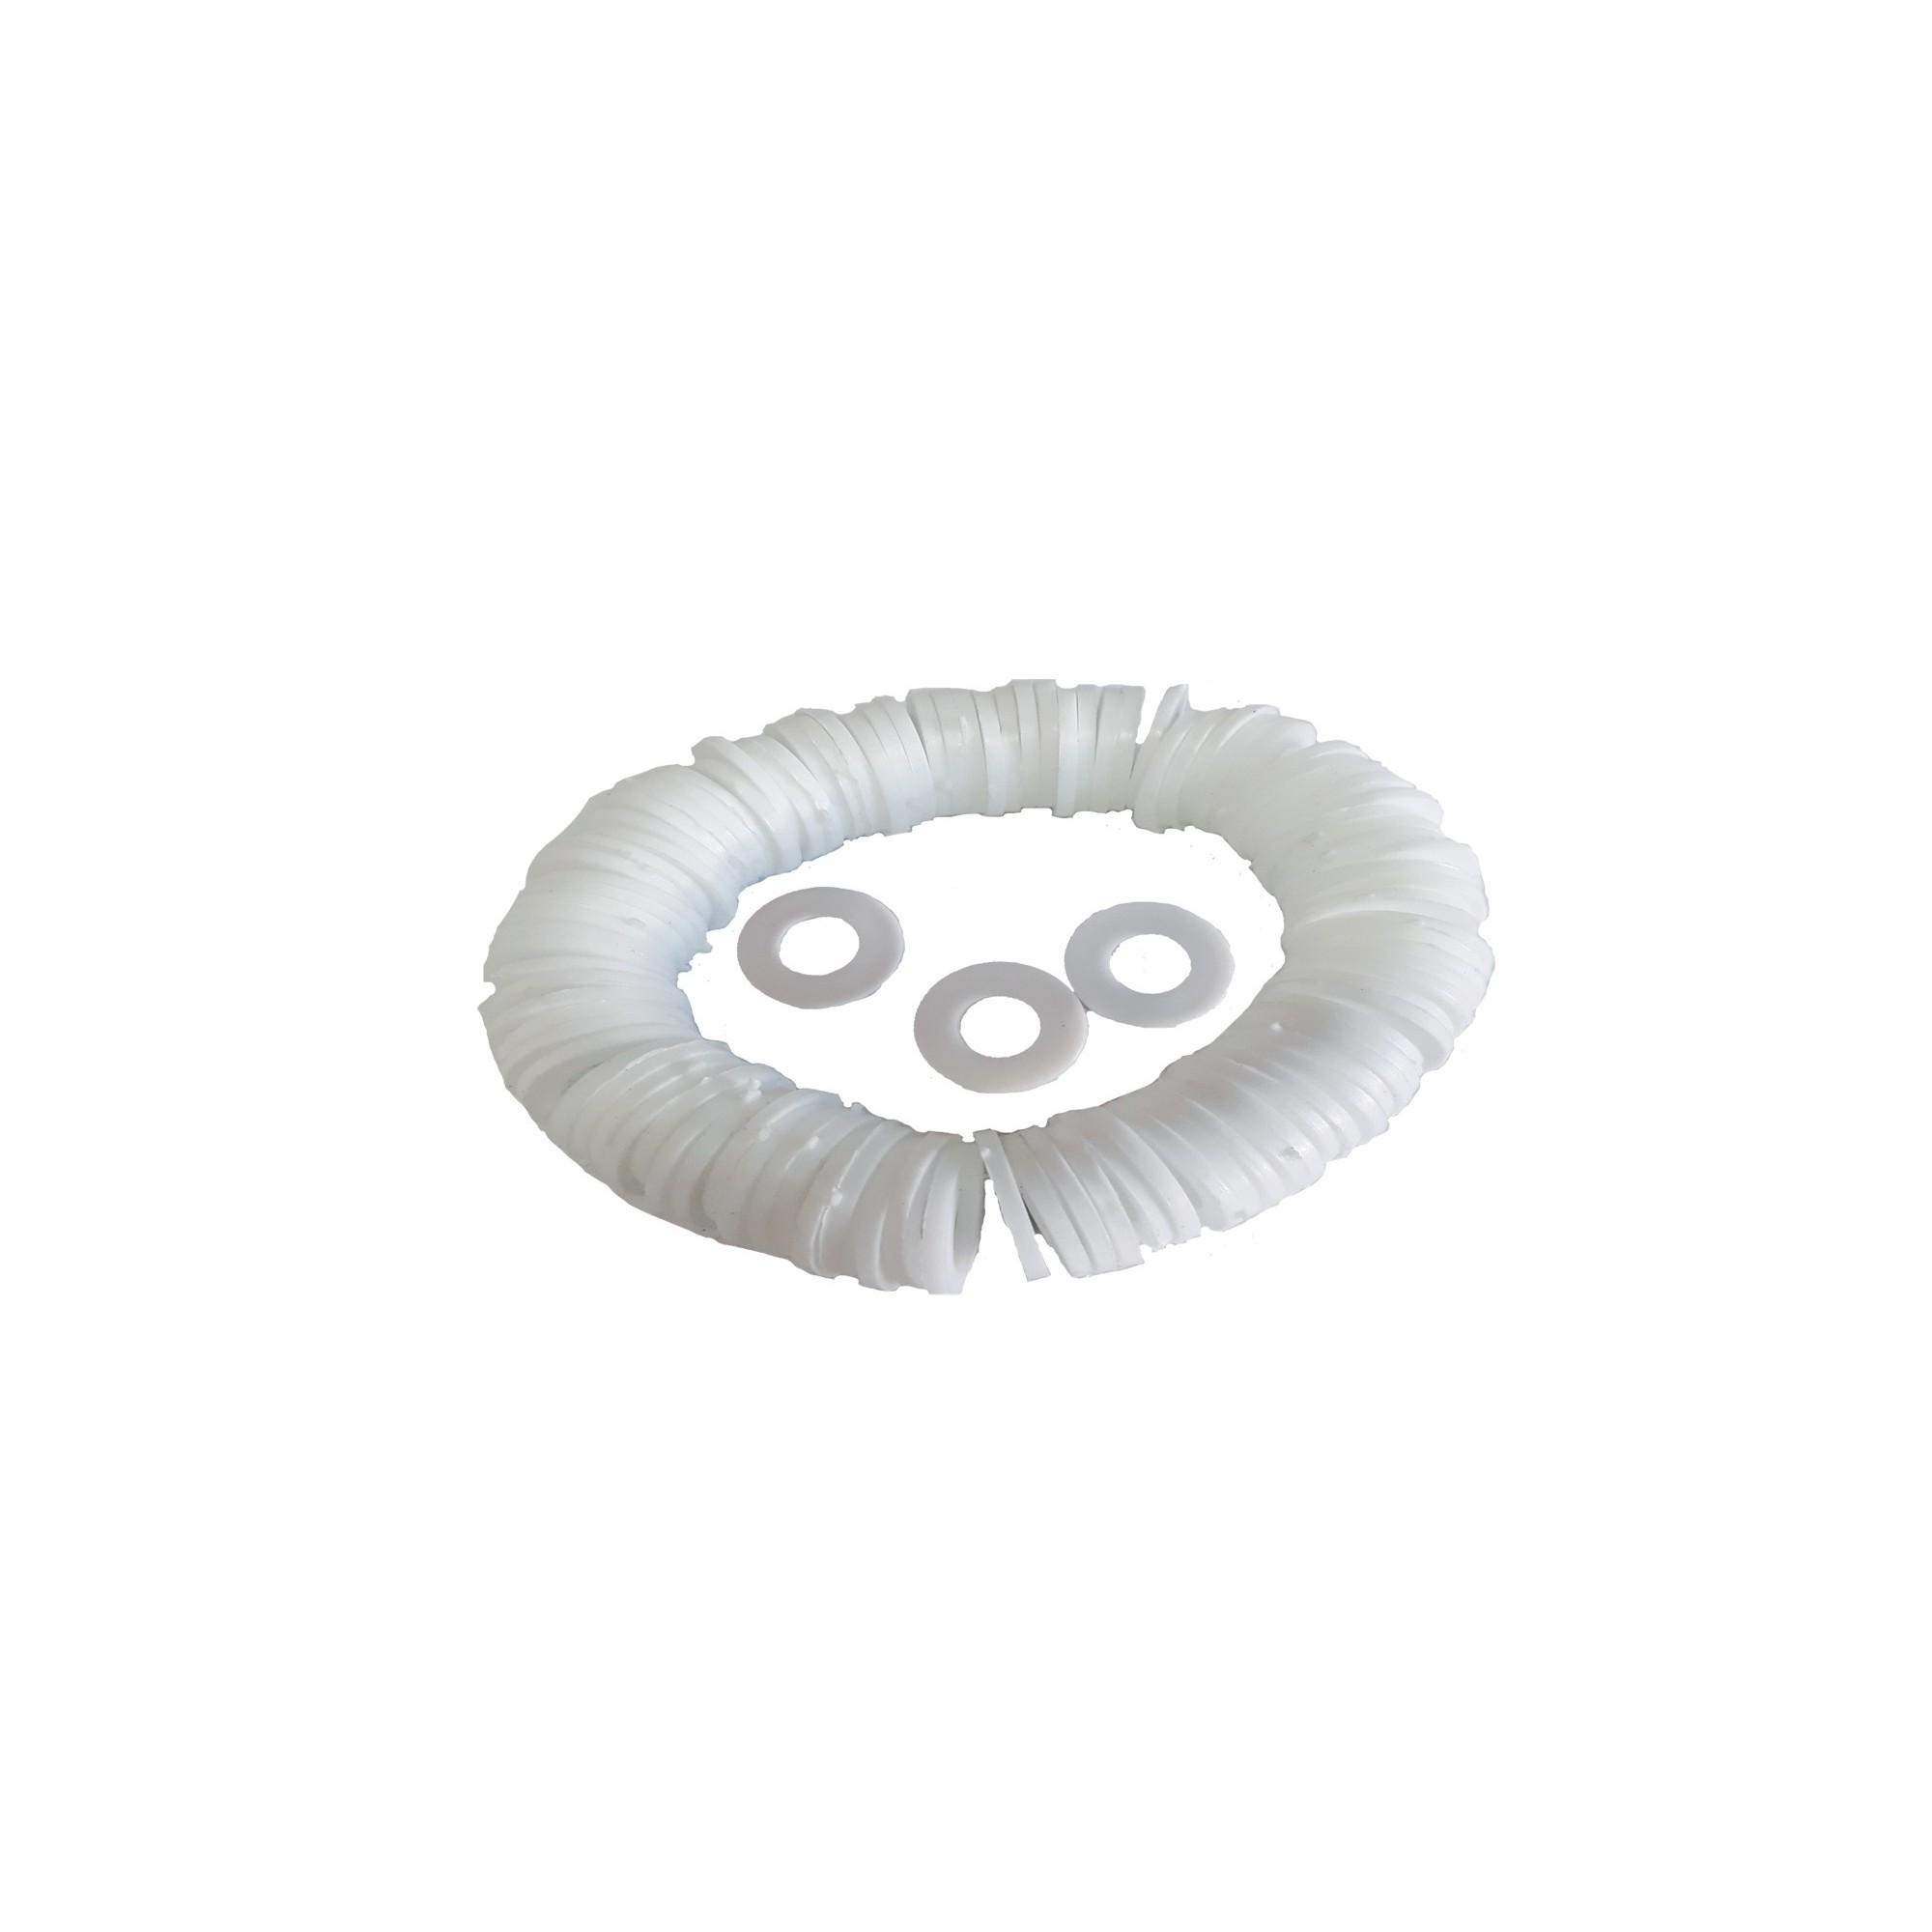 Упаковка фторопластовых прокладок 100 шт 3/4 J.G. - 1